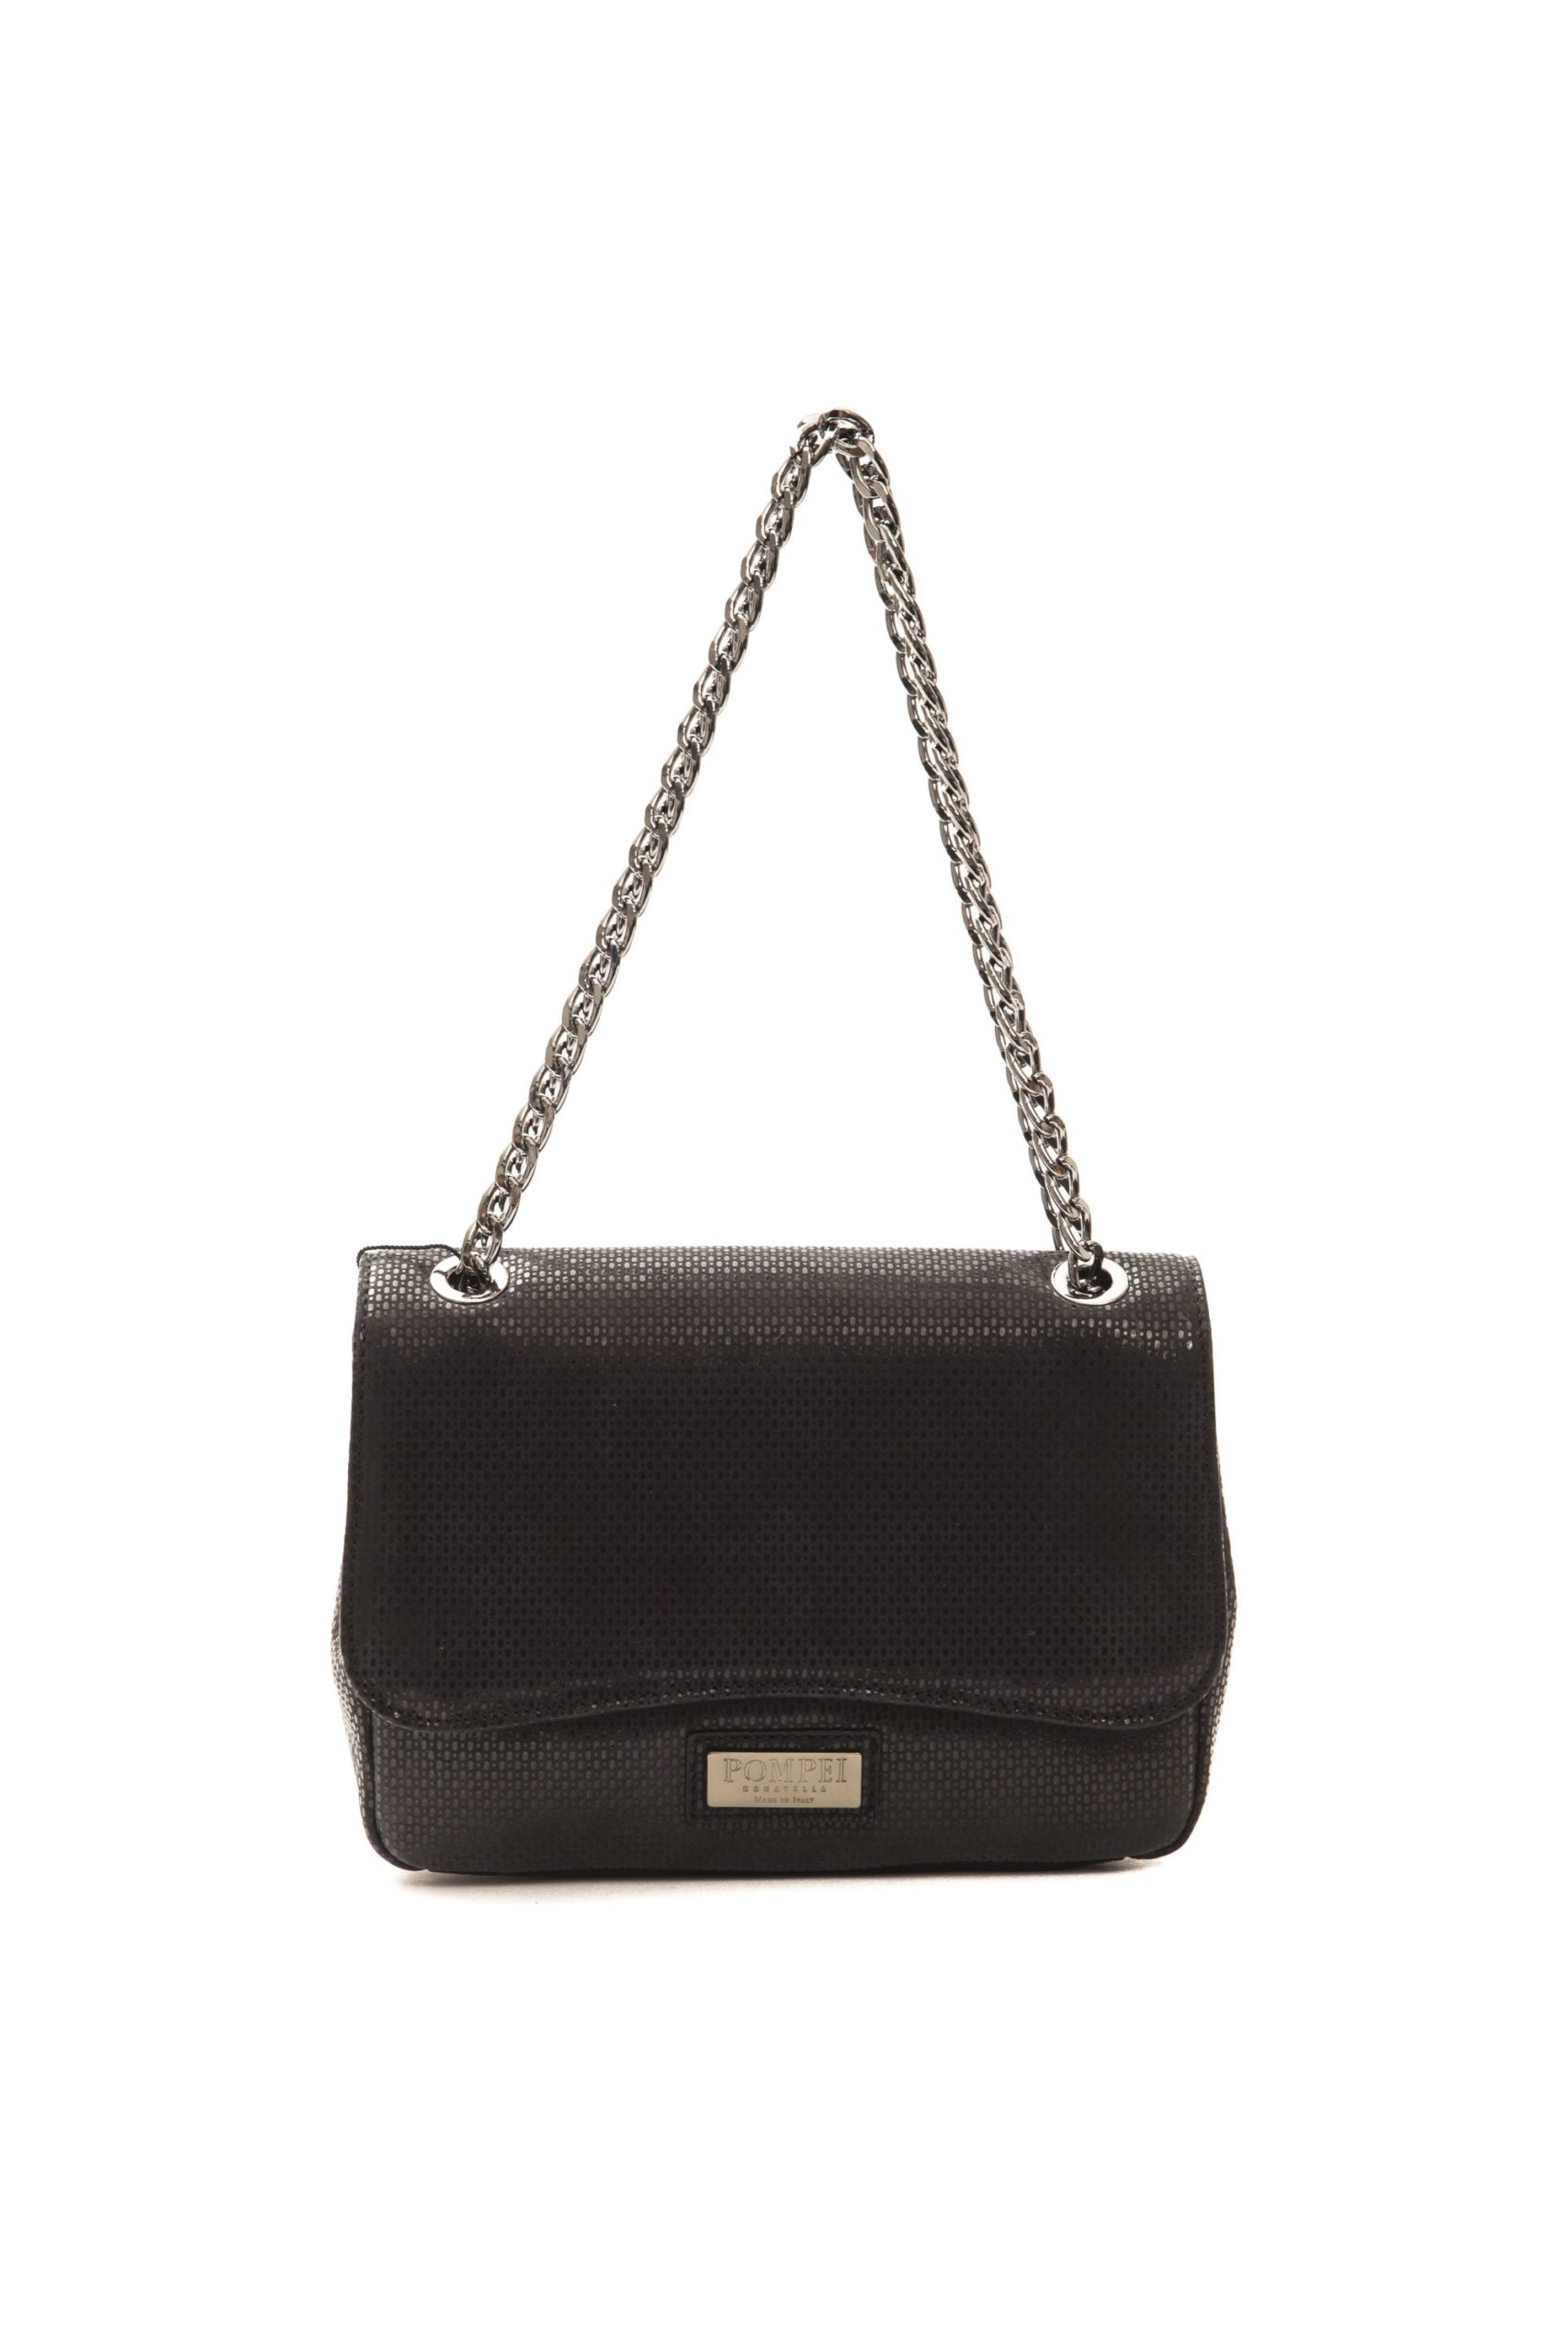 Pompei Donatella Women's Nero Crossbody Bag Black PO1005129